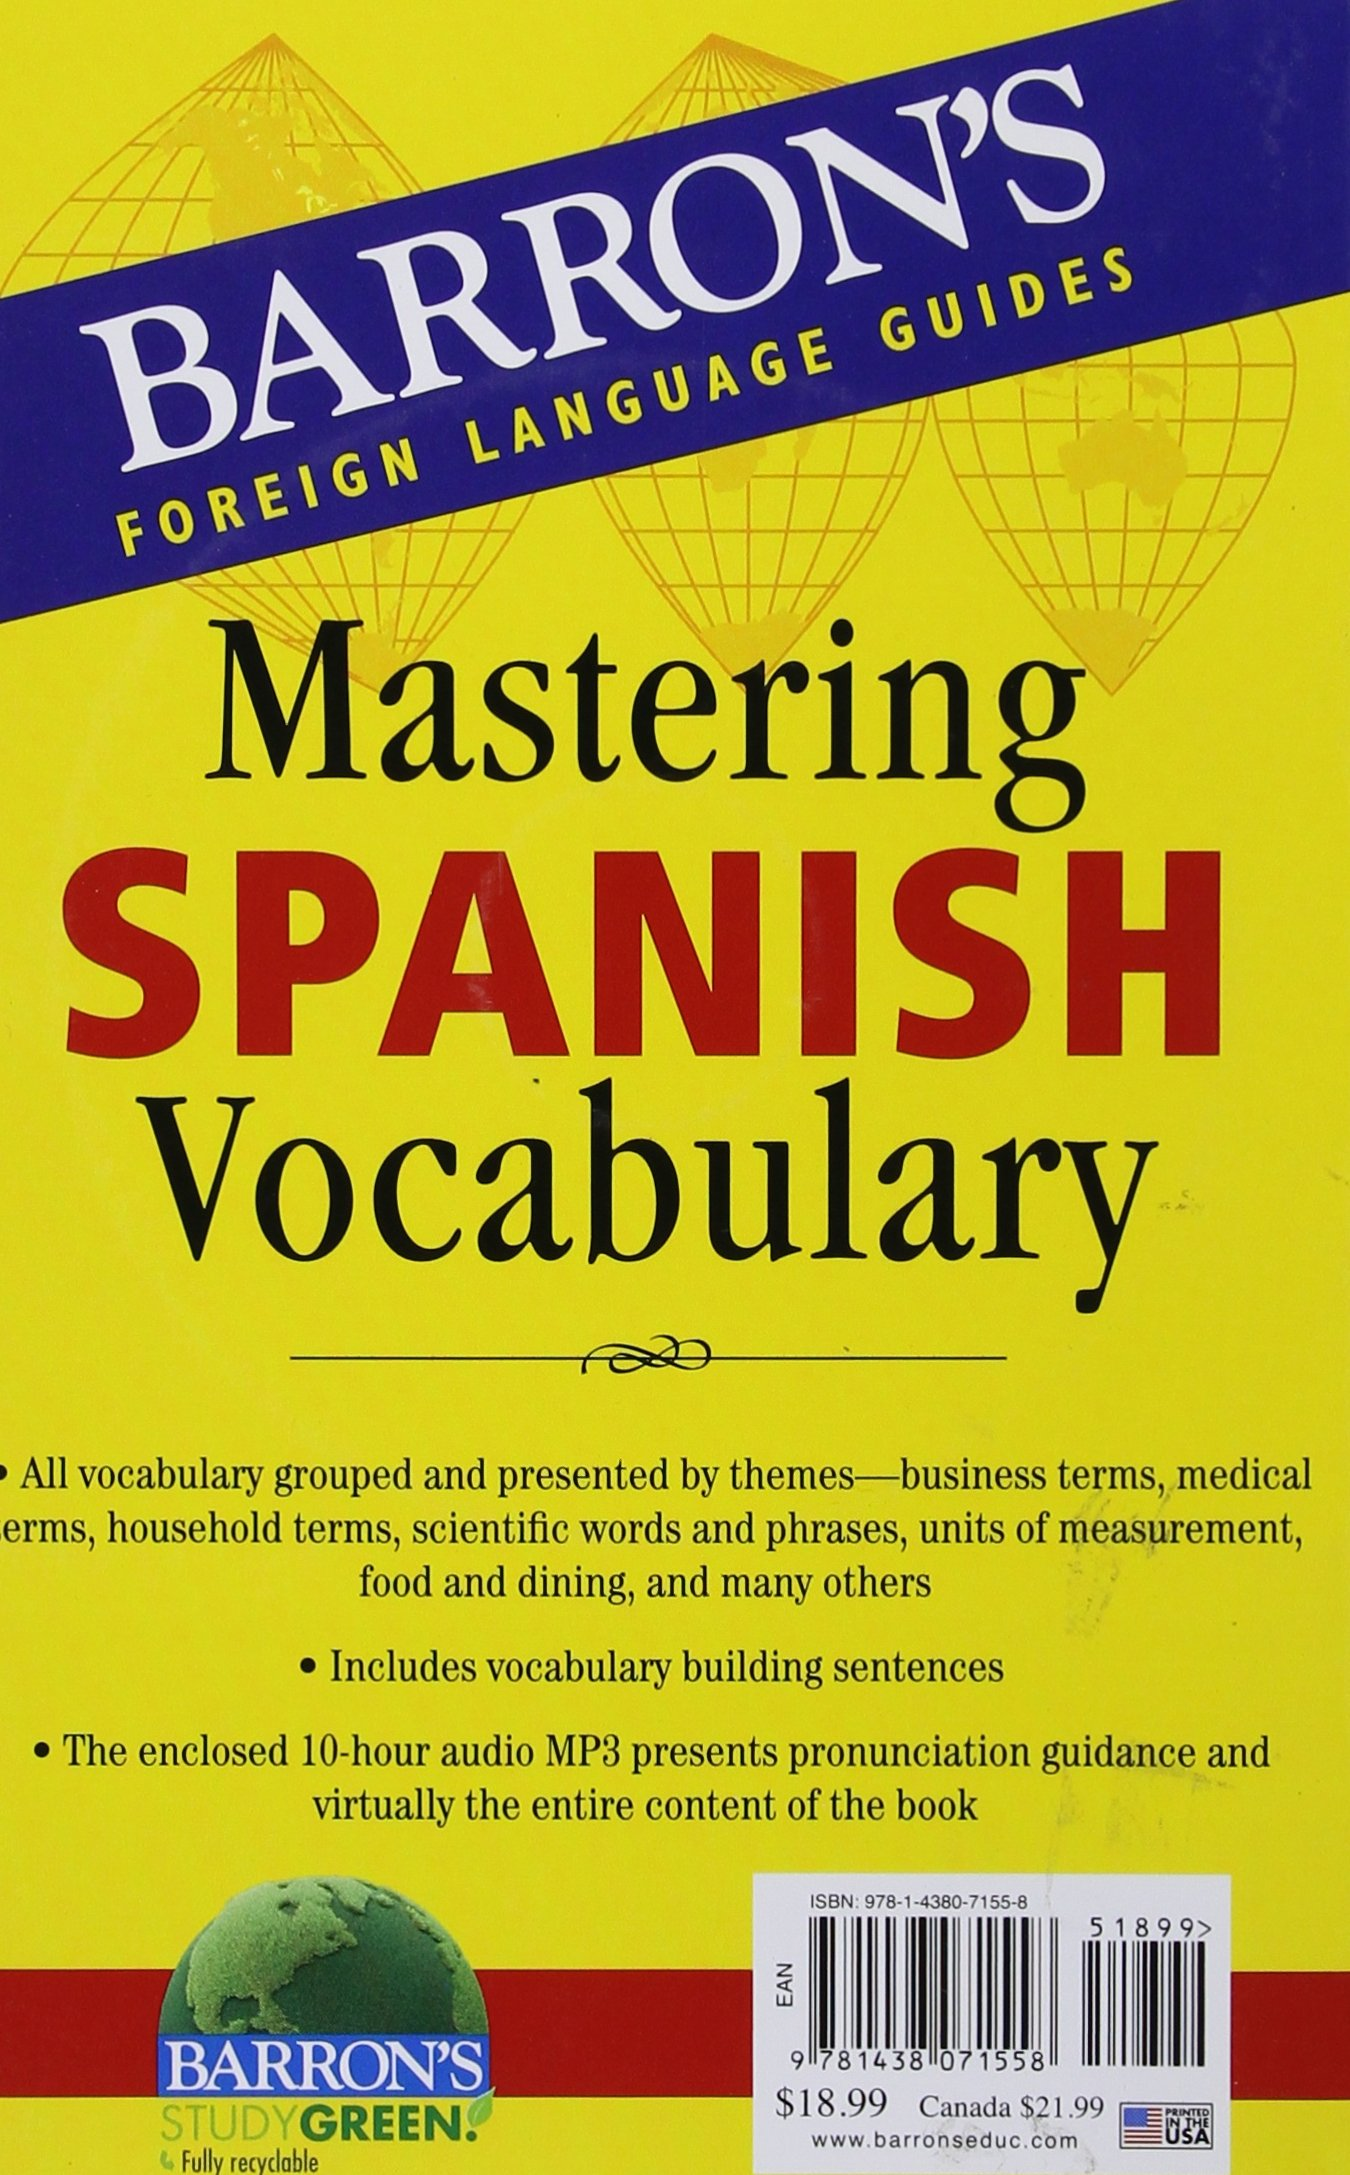 Amazon.com: Mastering Spanish Vocabulary with Audio MP3 (Barron's  Vocabulary Series) (9781438071558): Jose Maria Navarro, Axel J. Navarro  Ramil: Books